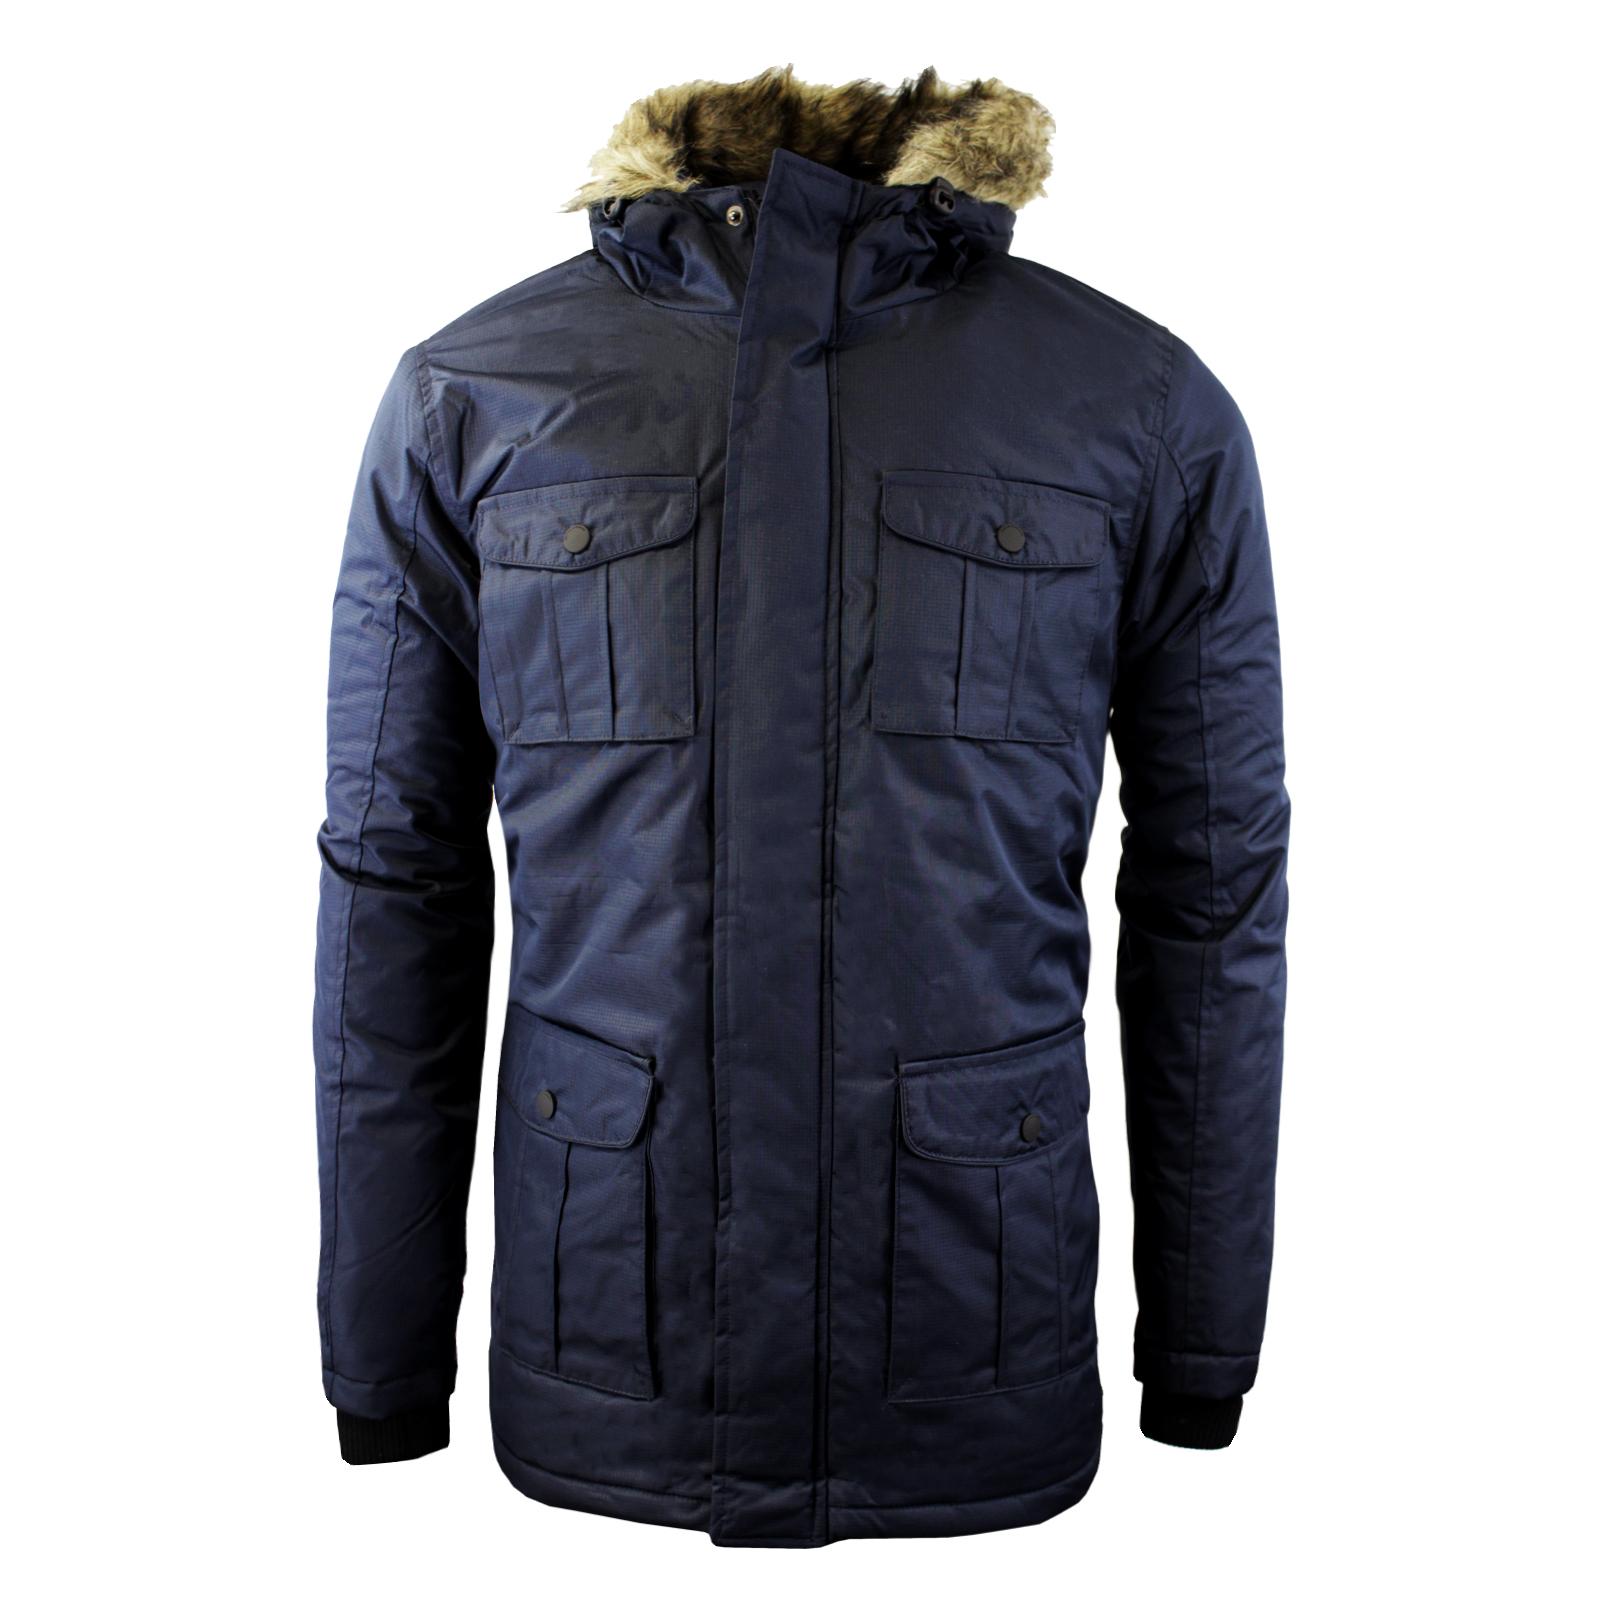 Mens Winter Coat by Brave Soul 'Canadian' Hooded Parka